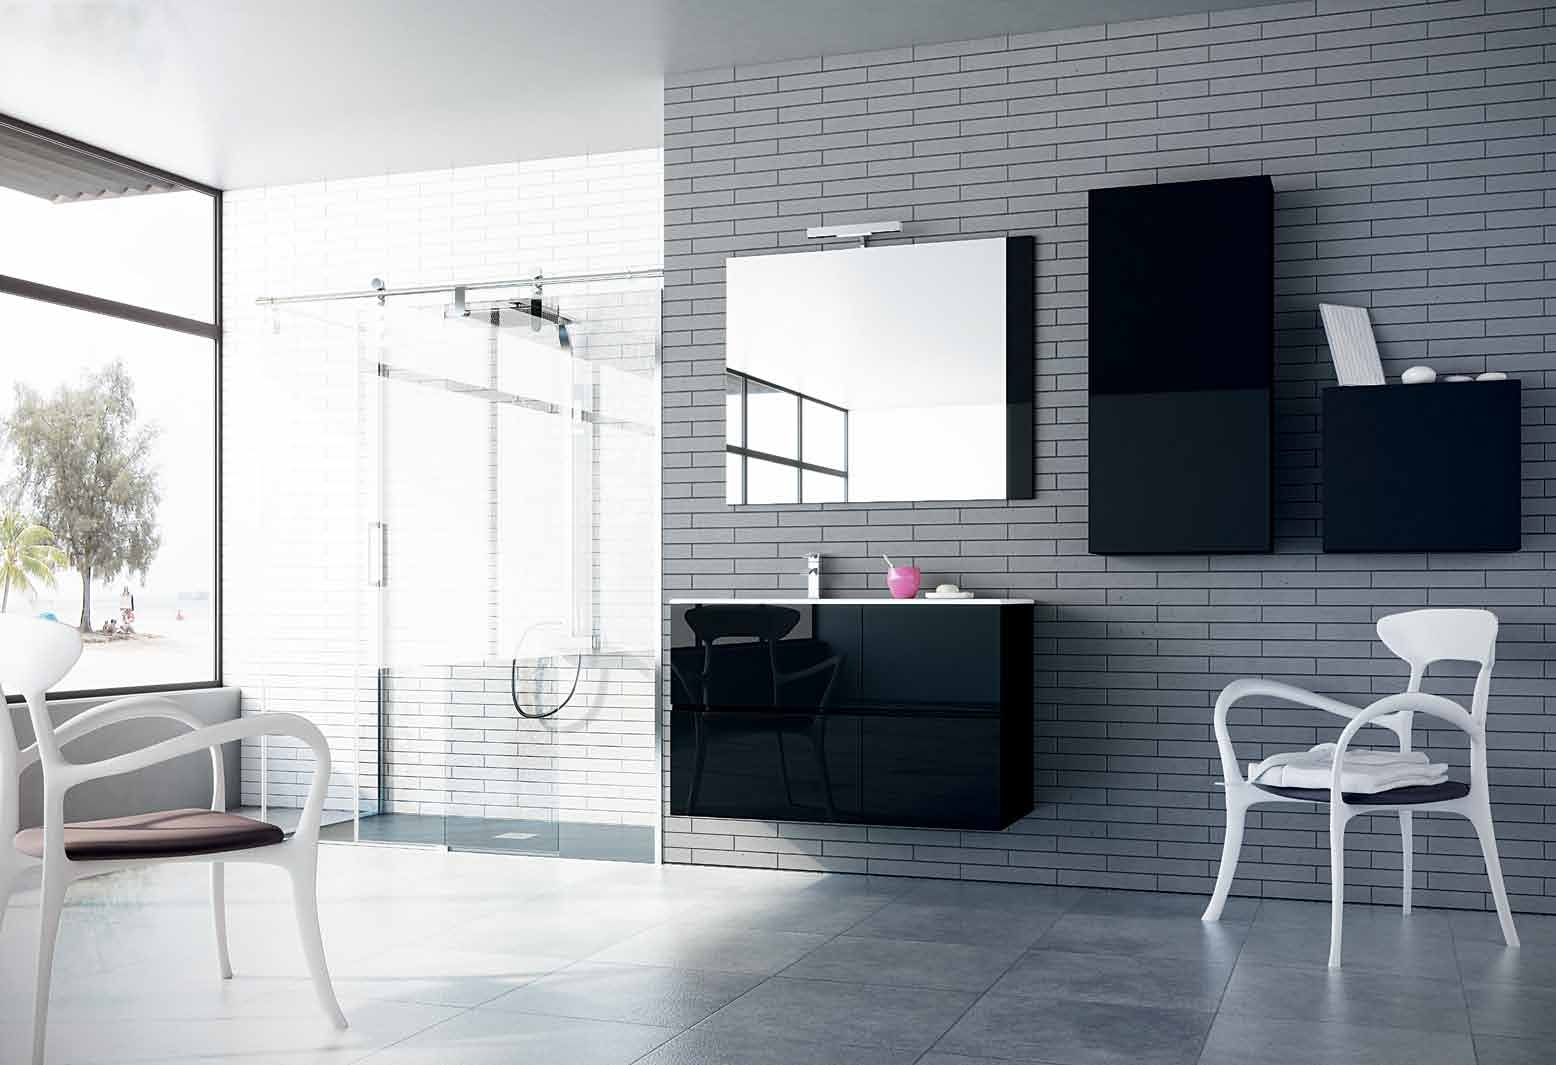 Muebles De Baño Keiblair:Muebles de baño para cuartos de baño modernos